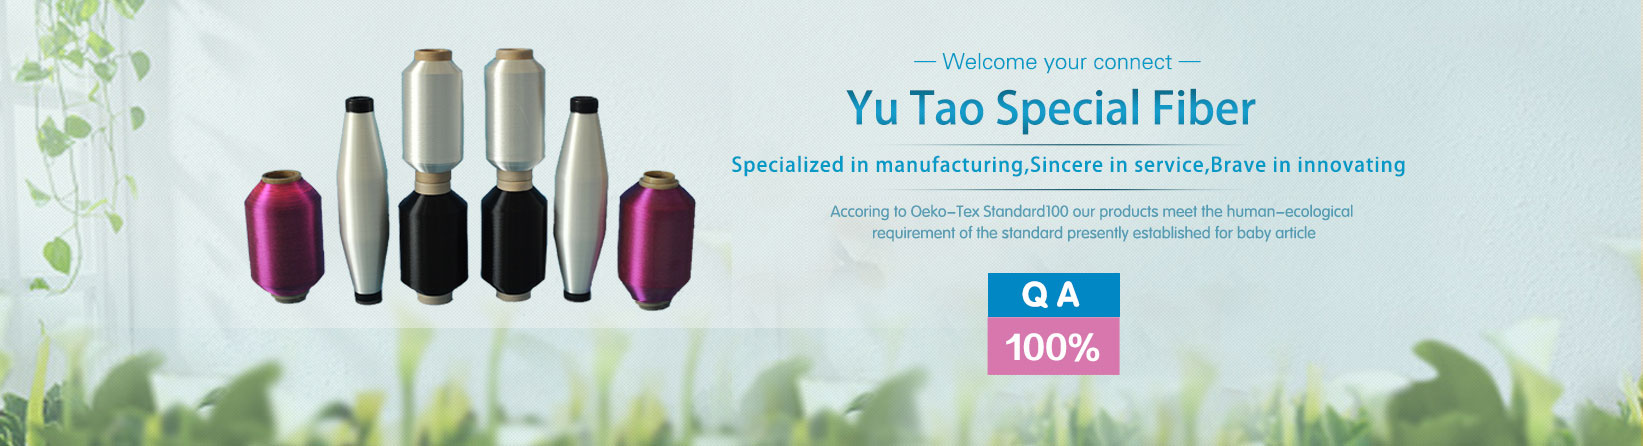 Yu Tao Special